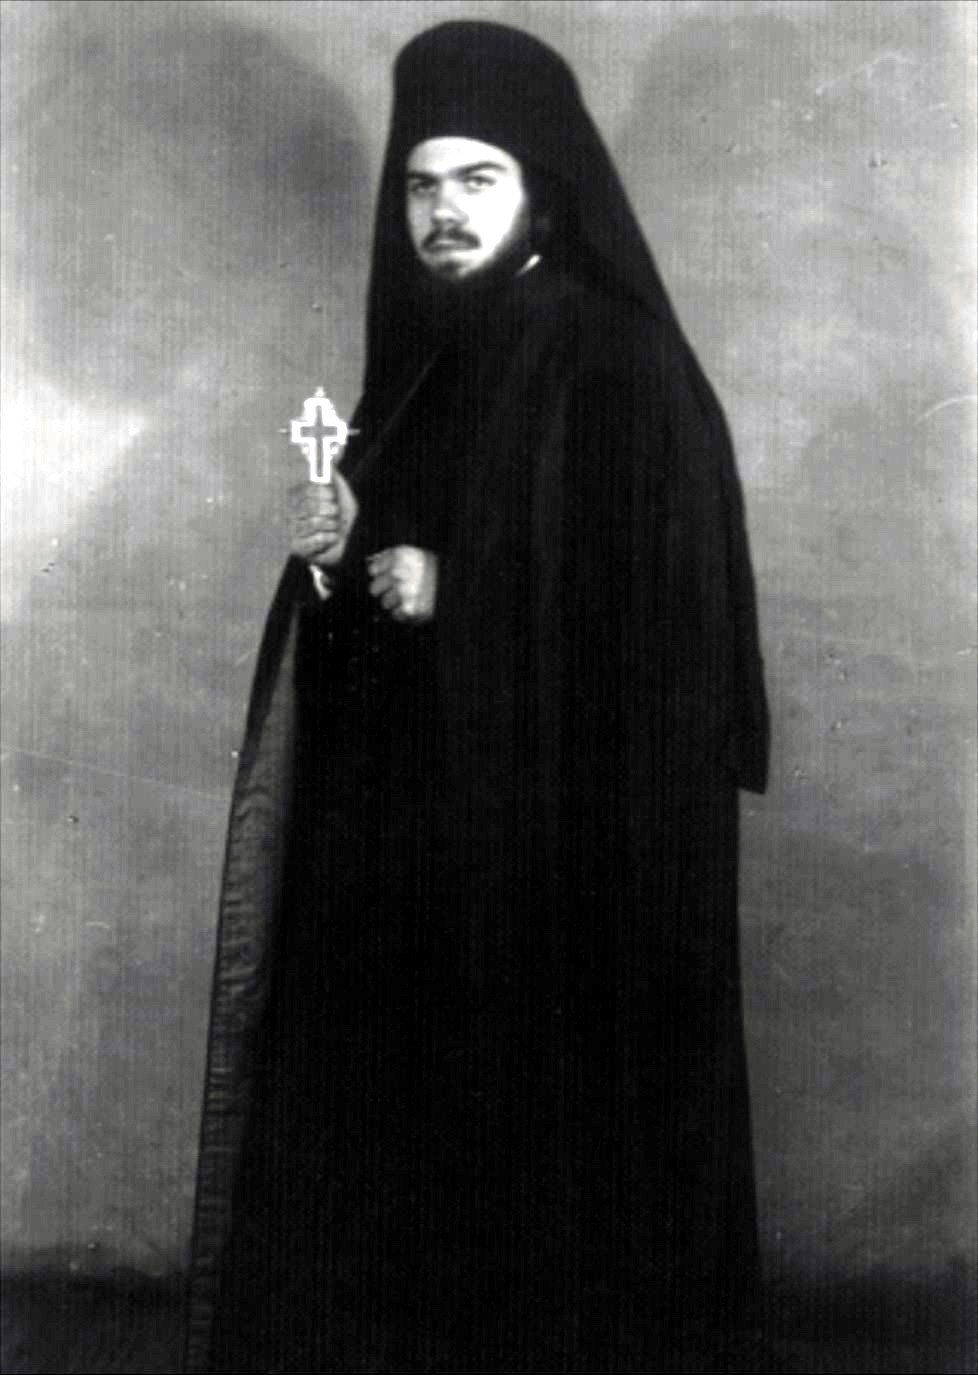 Parintele Bartolomeu Anania - Imagine inedita 3 - Marturisitorii Ro